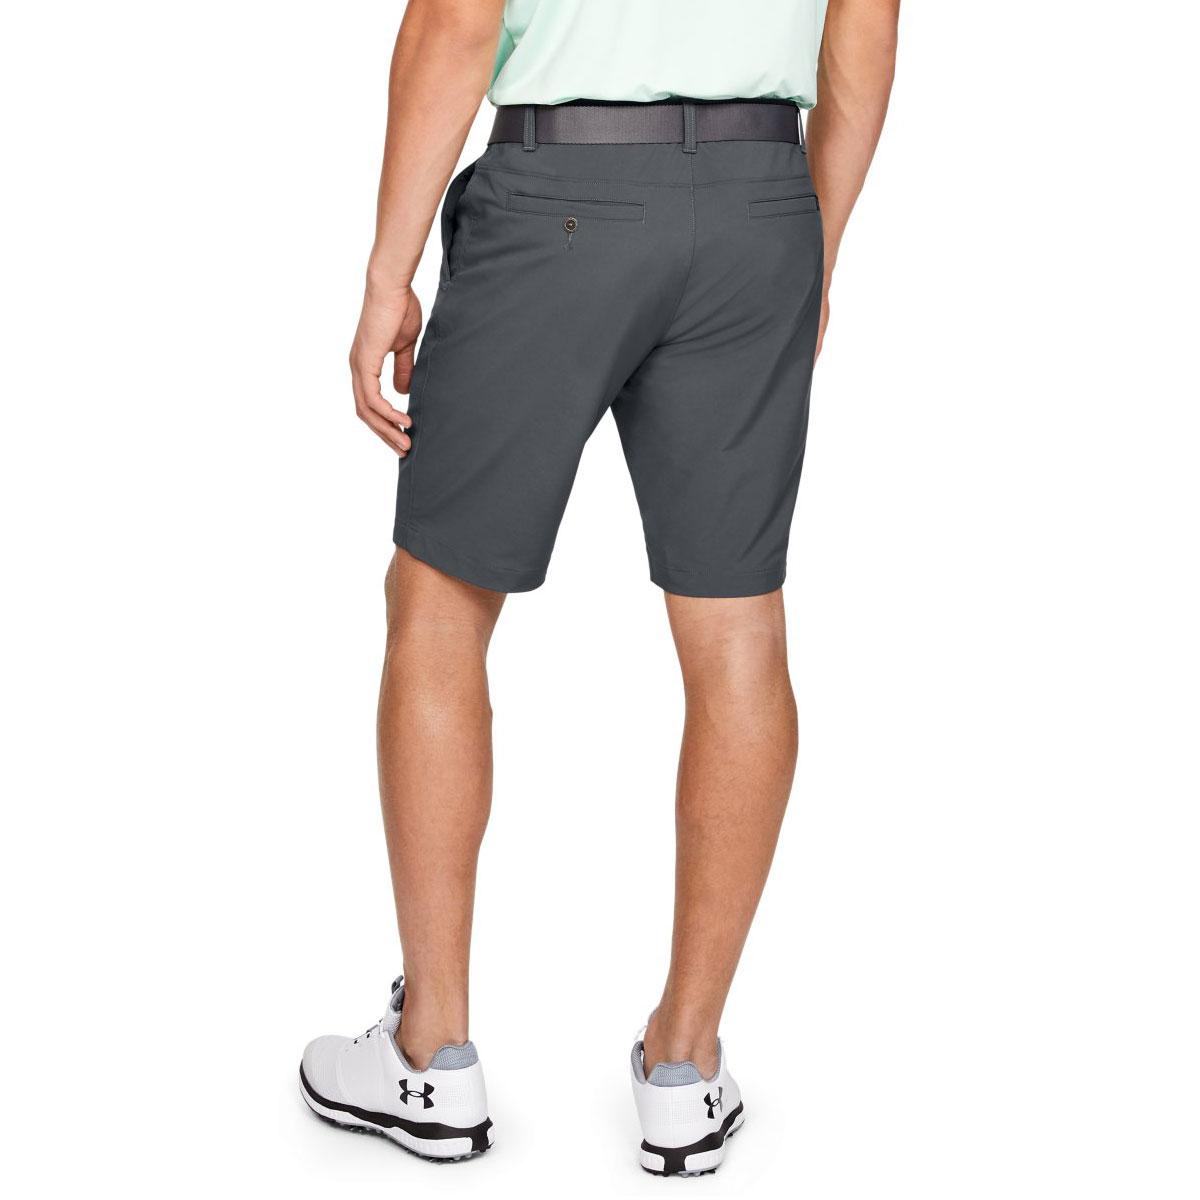 Under-Armour-Mens-2019-EU-Performance-Taper-Stretch-Soft-Comfort-Golf-Shorts thumbnail 11